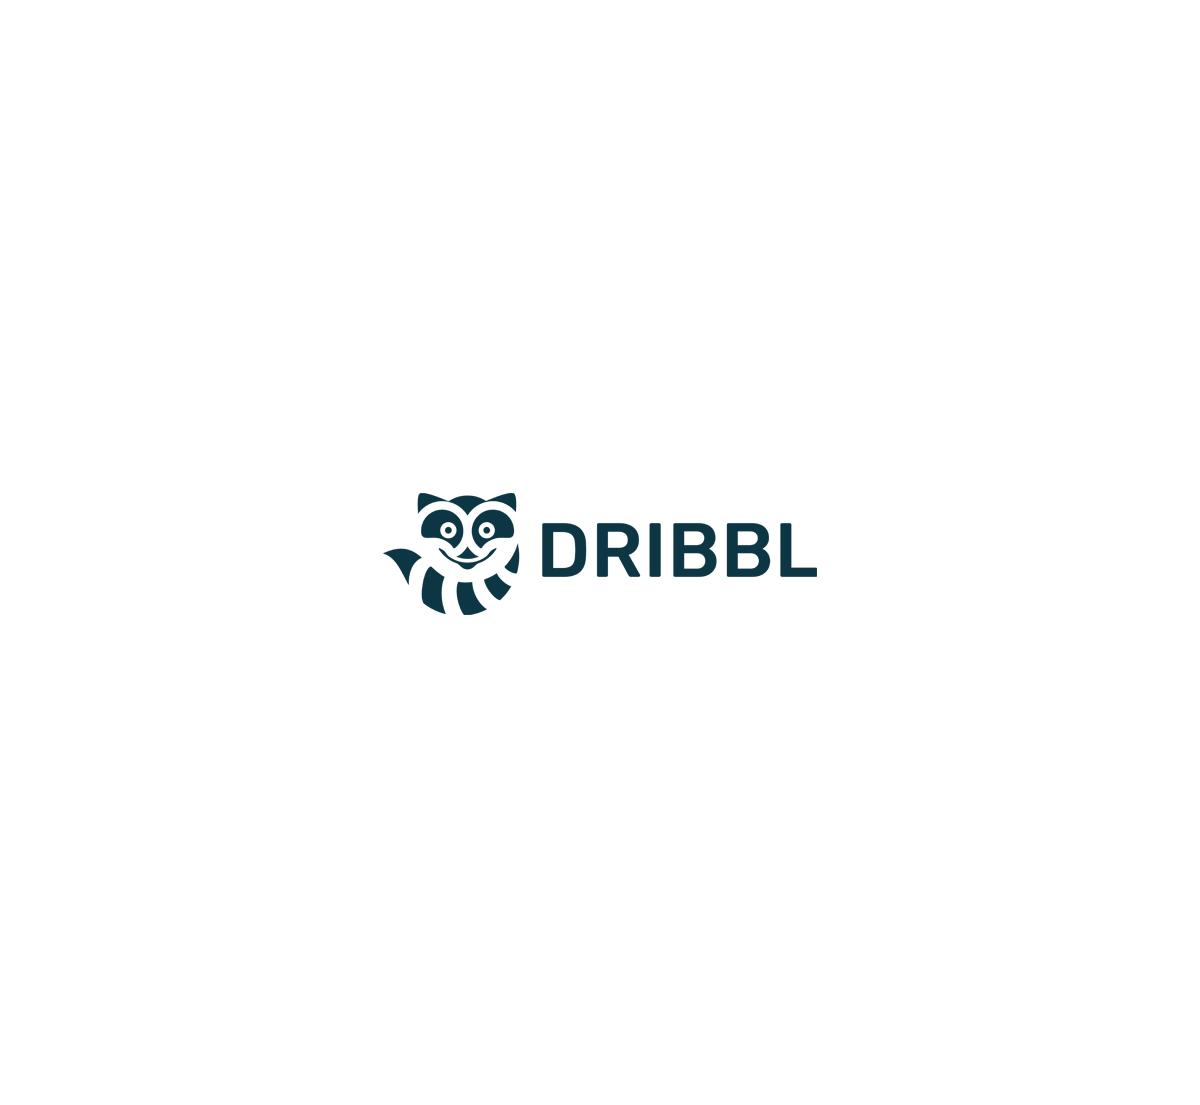 Разработка логотипа для сайта Dribbl.ru фото f_7705a9ed8b18538d.jpg